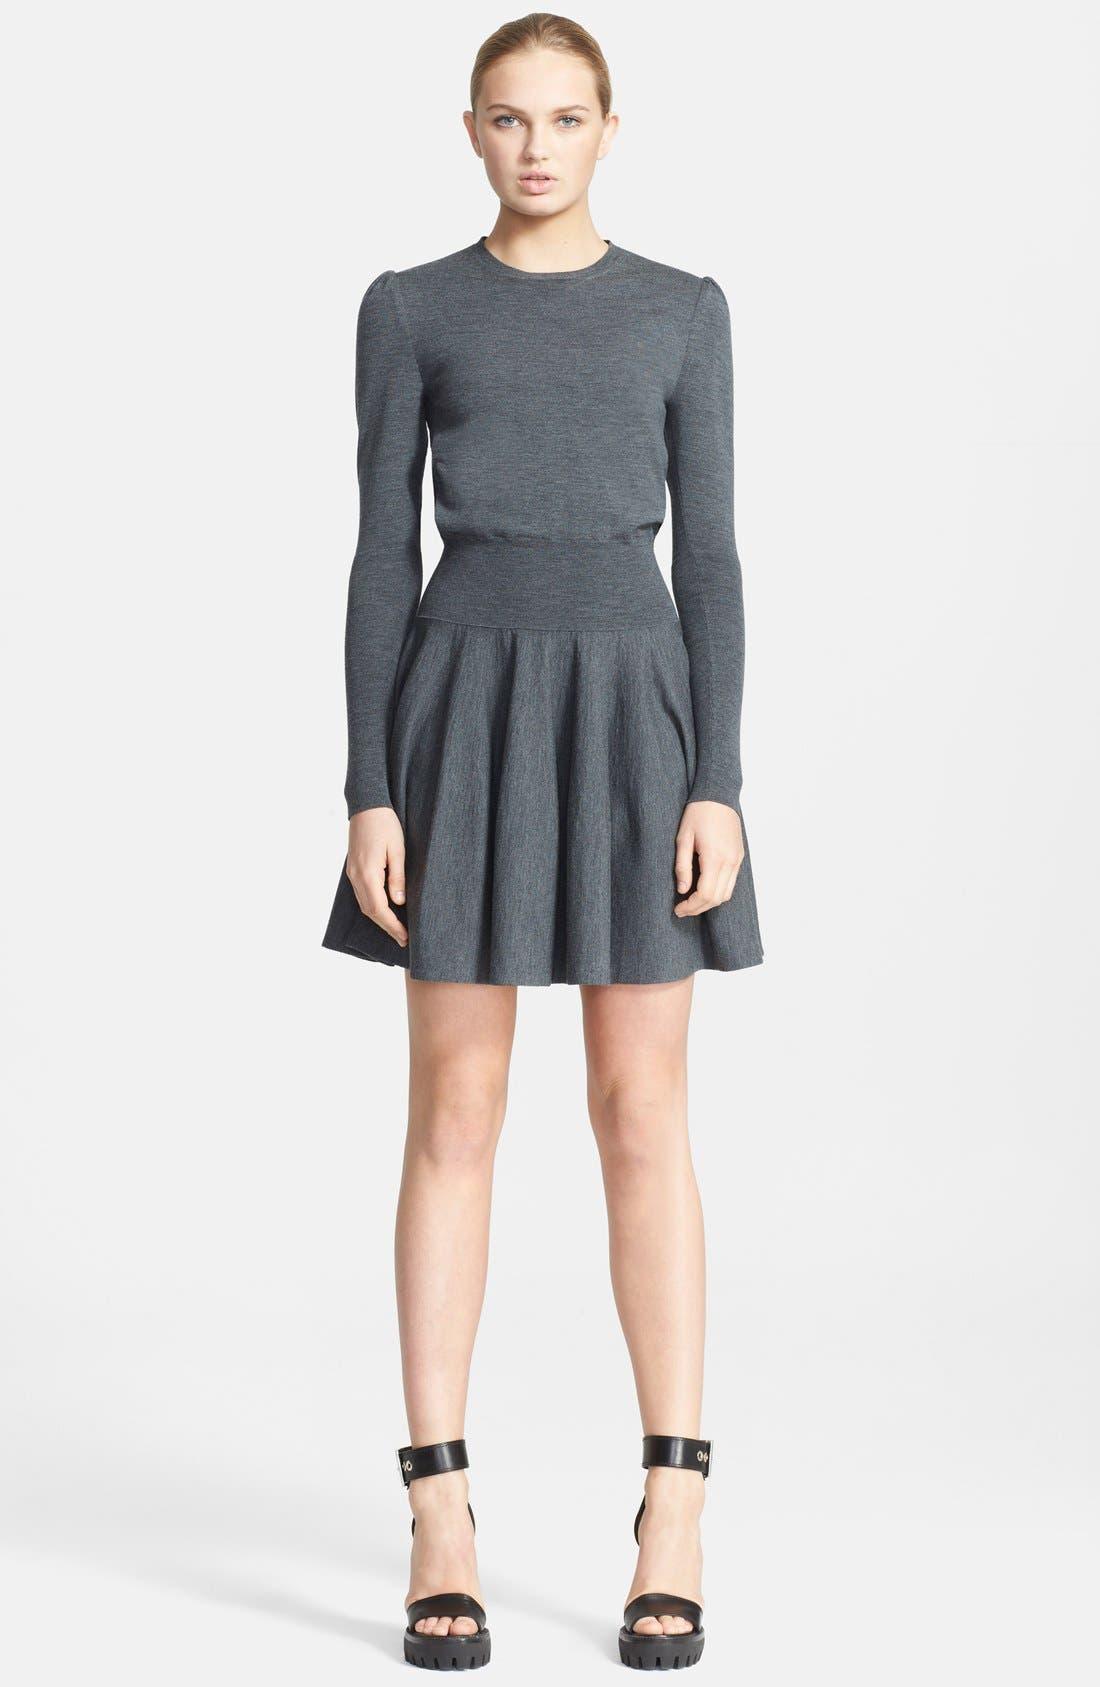 Main Image - Alexander McQueen Fit & Flare Knit Dress